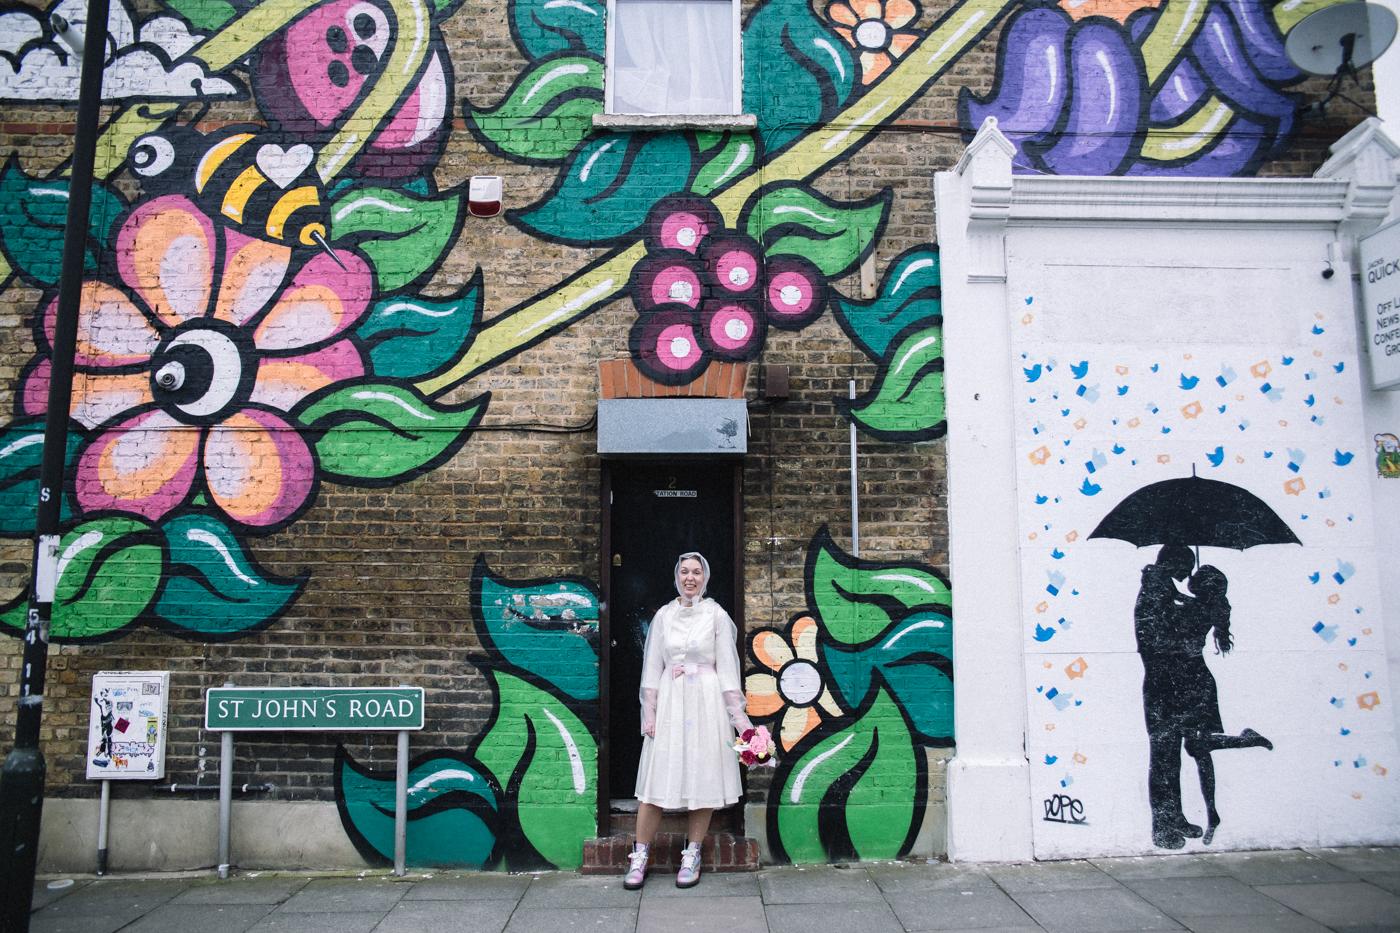 knights-templar-london-city-centre-wedding-photographer-charing-cross-creative-0010.jpg